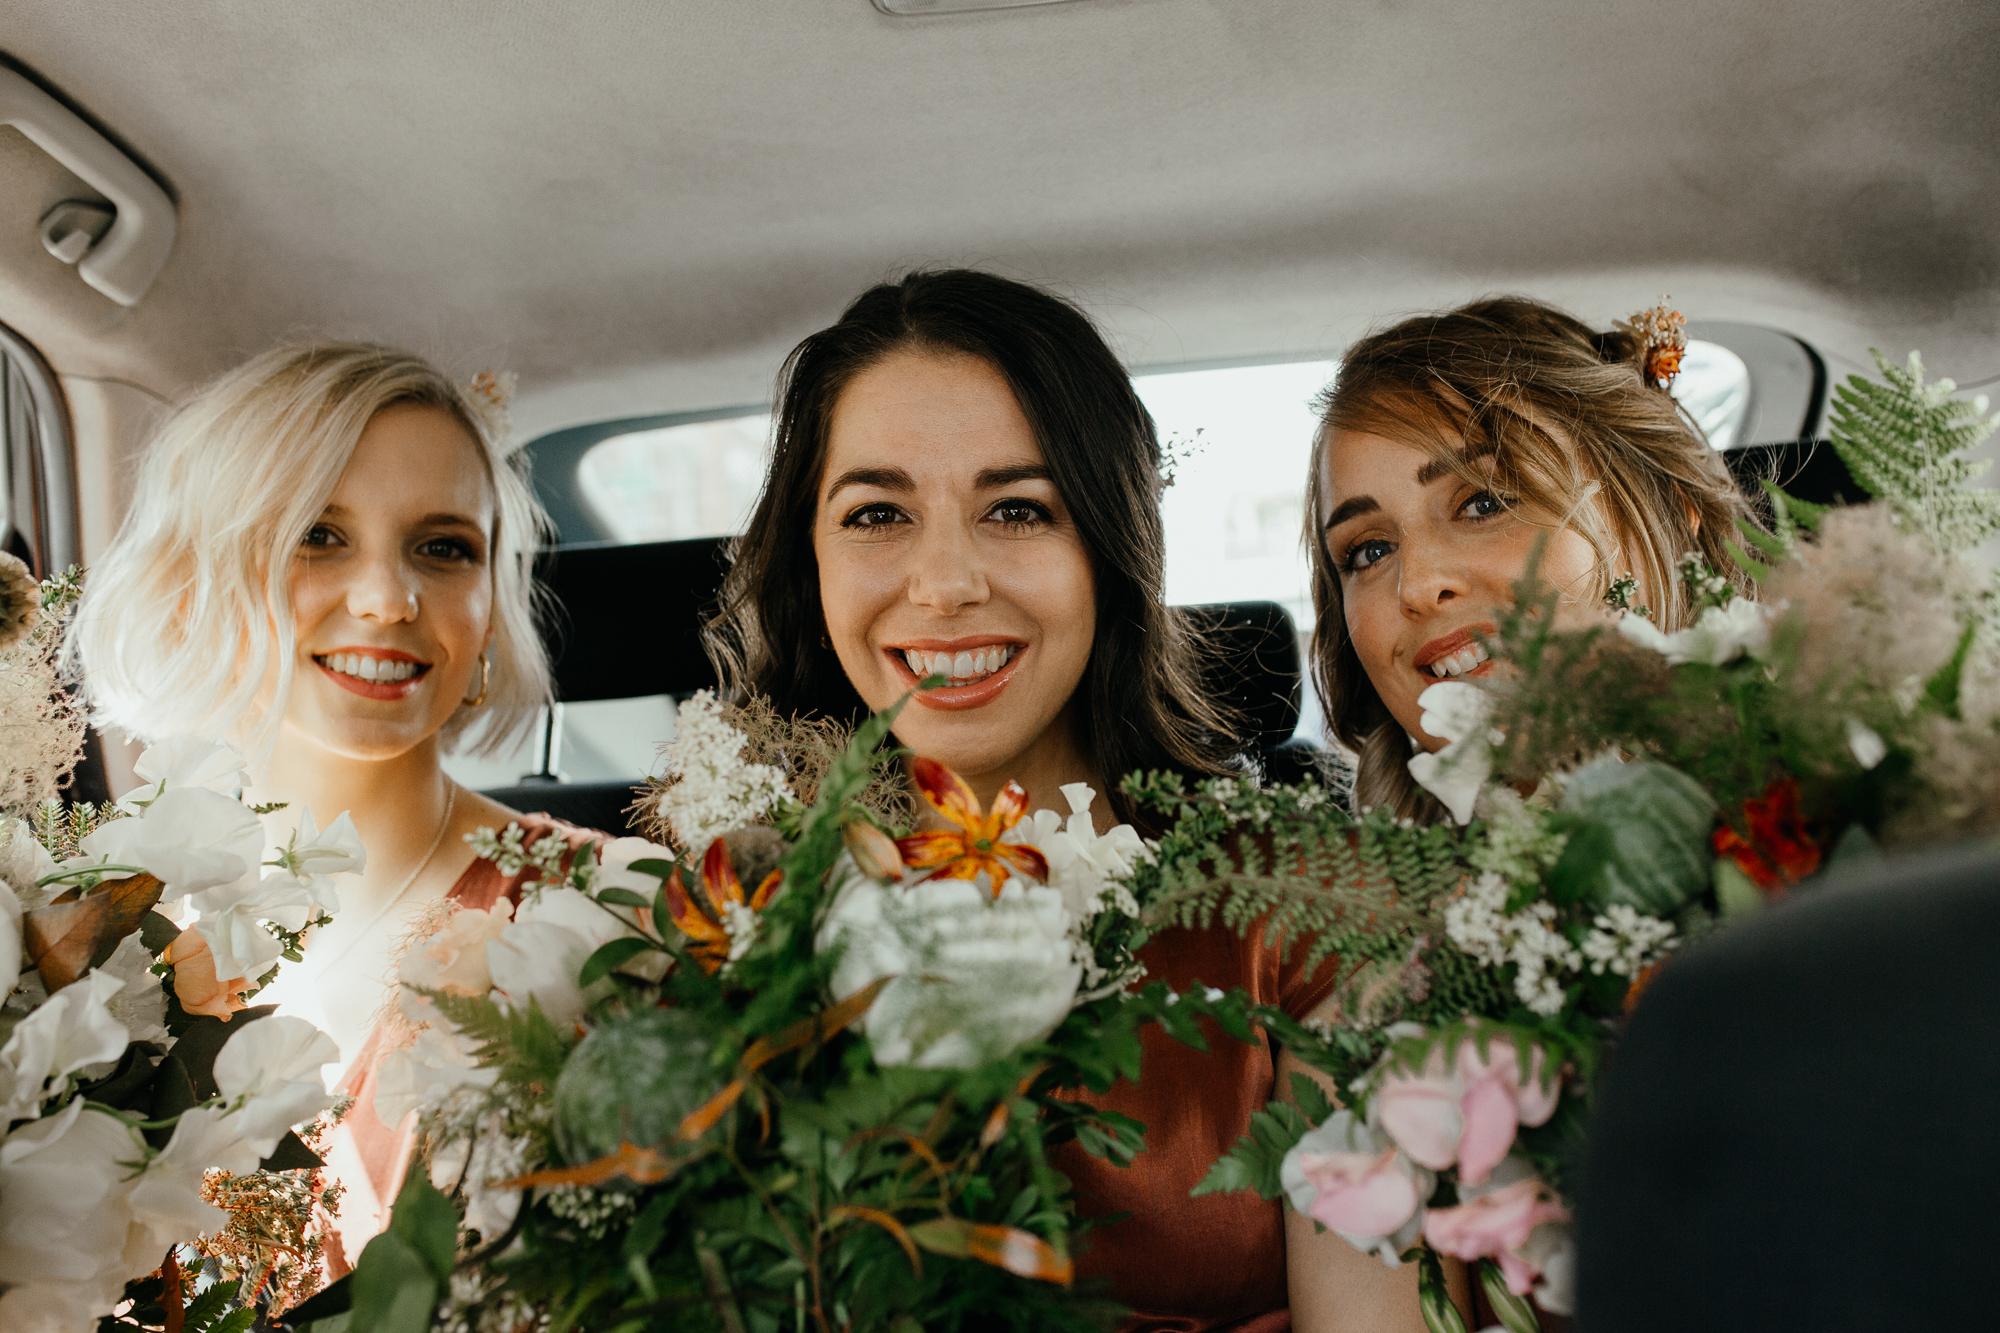 Nicebunch wedding flowers sula london-islington-town-hall-depot-n7 ethical british luxury bridesmaid bouquets ferns stephanie-green-wedding-photography